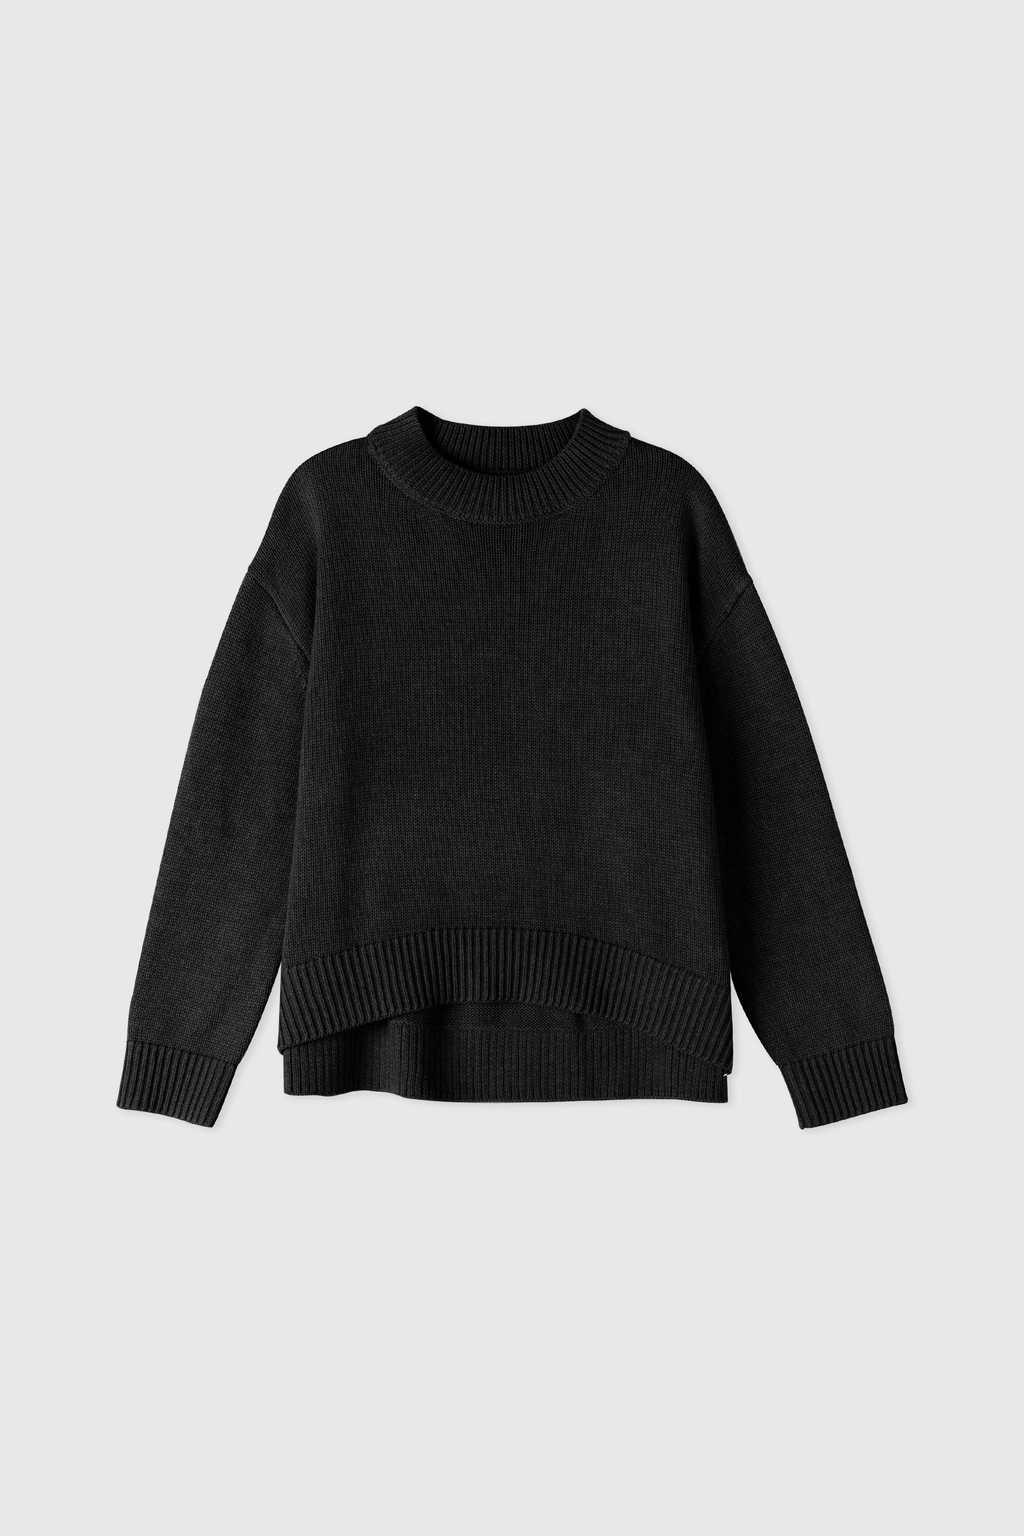 Sweater 3322 Black 12